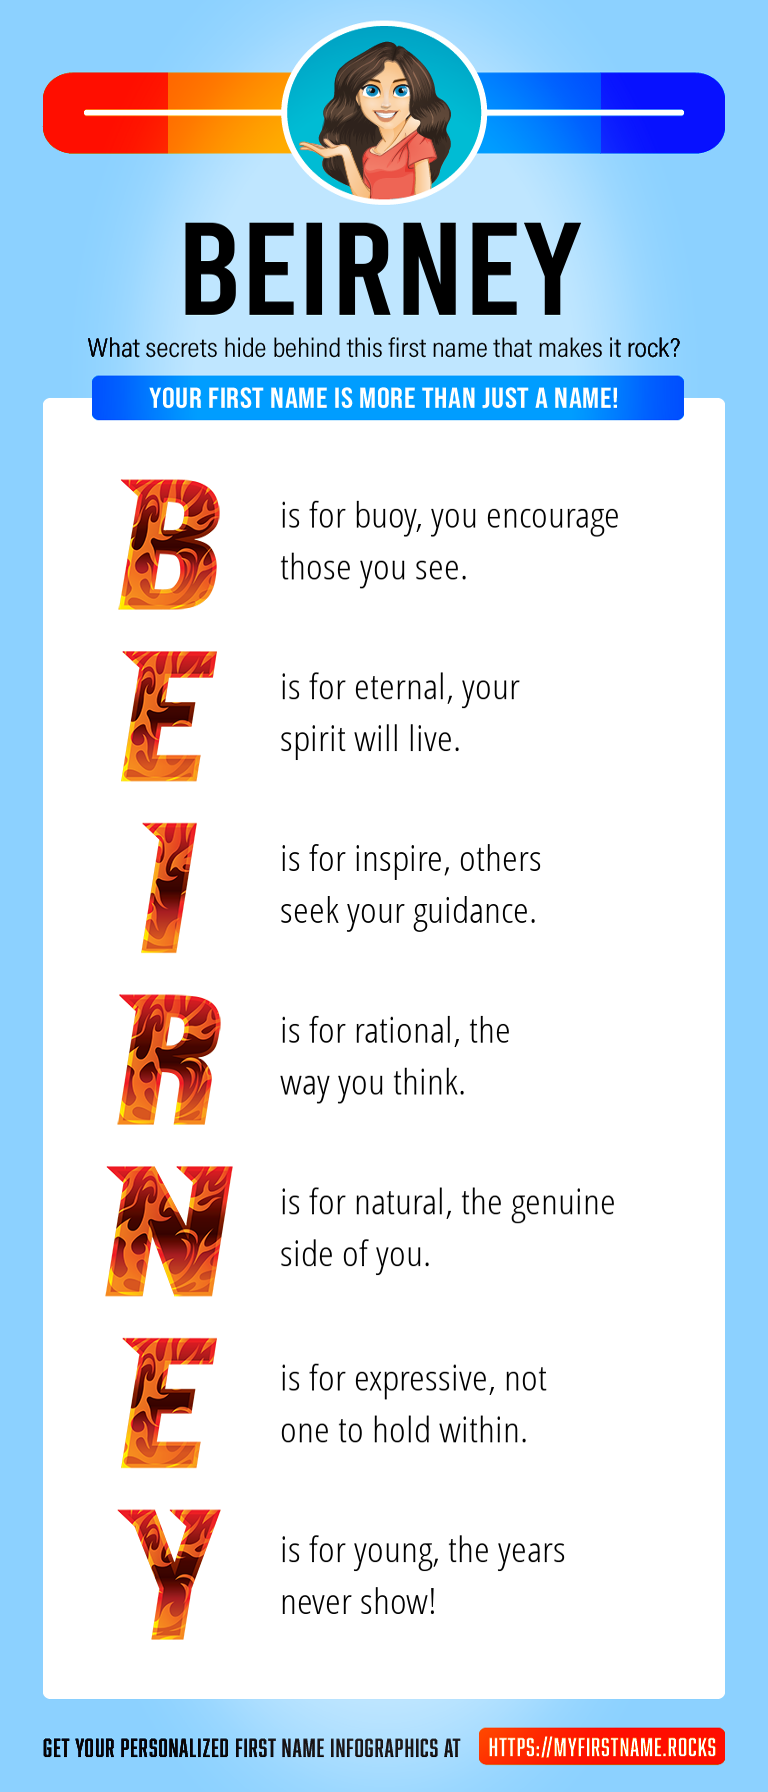 Beirney Infographics